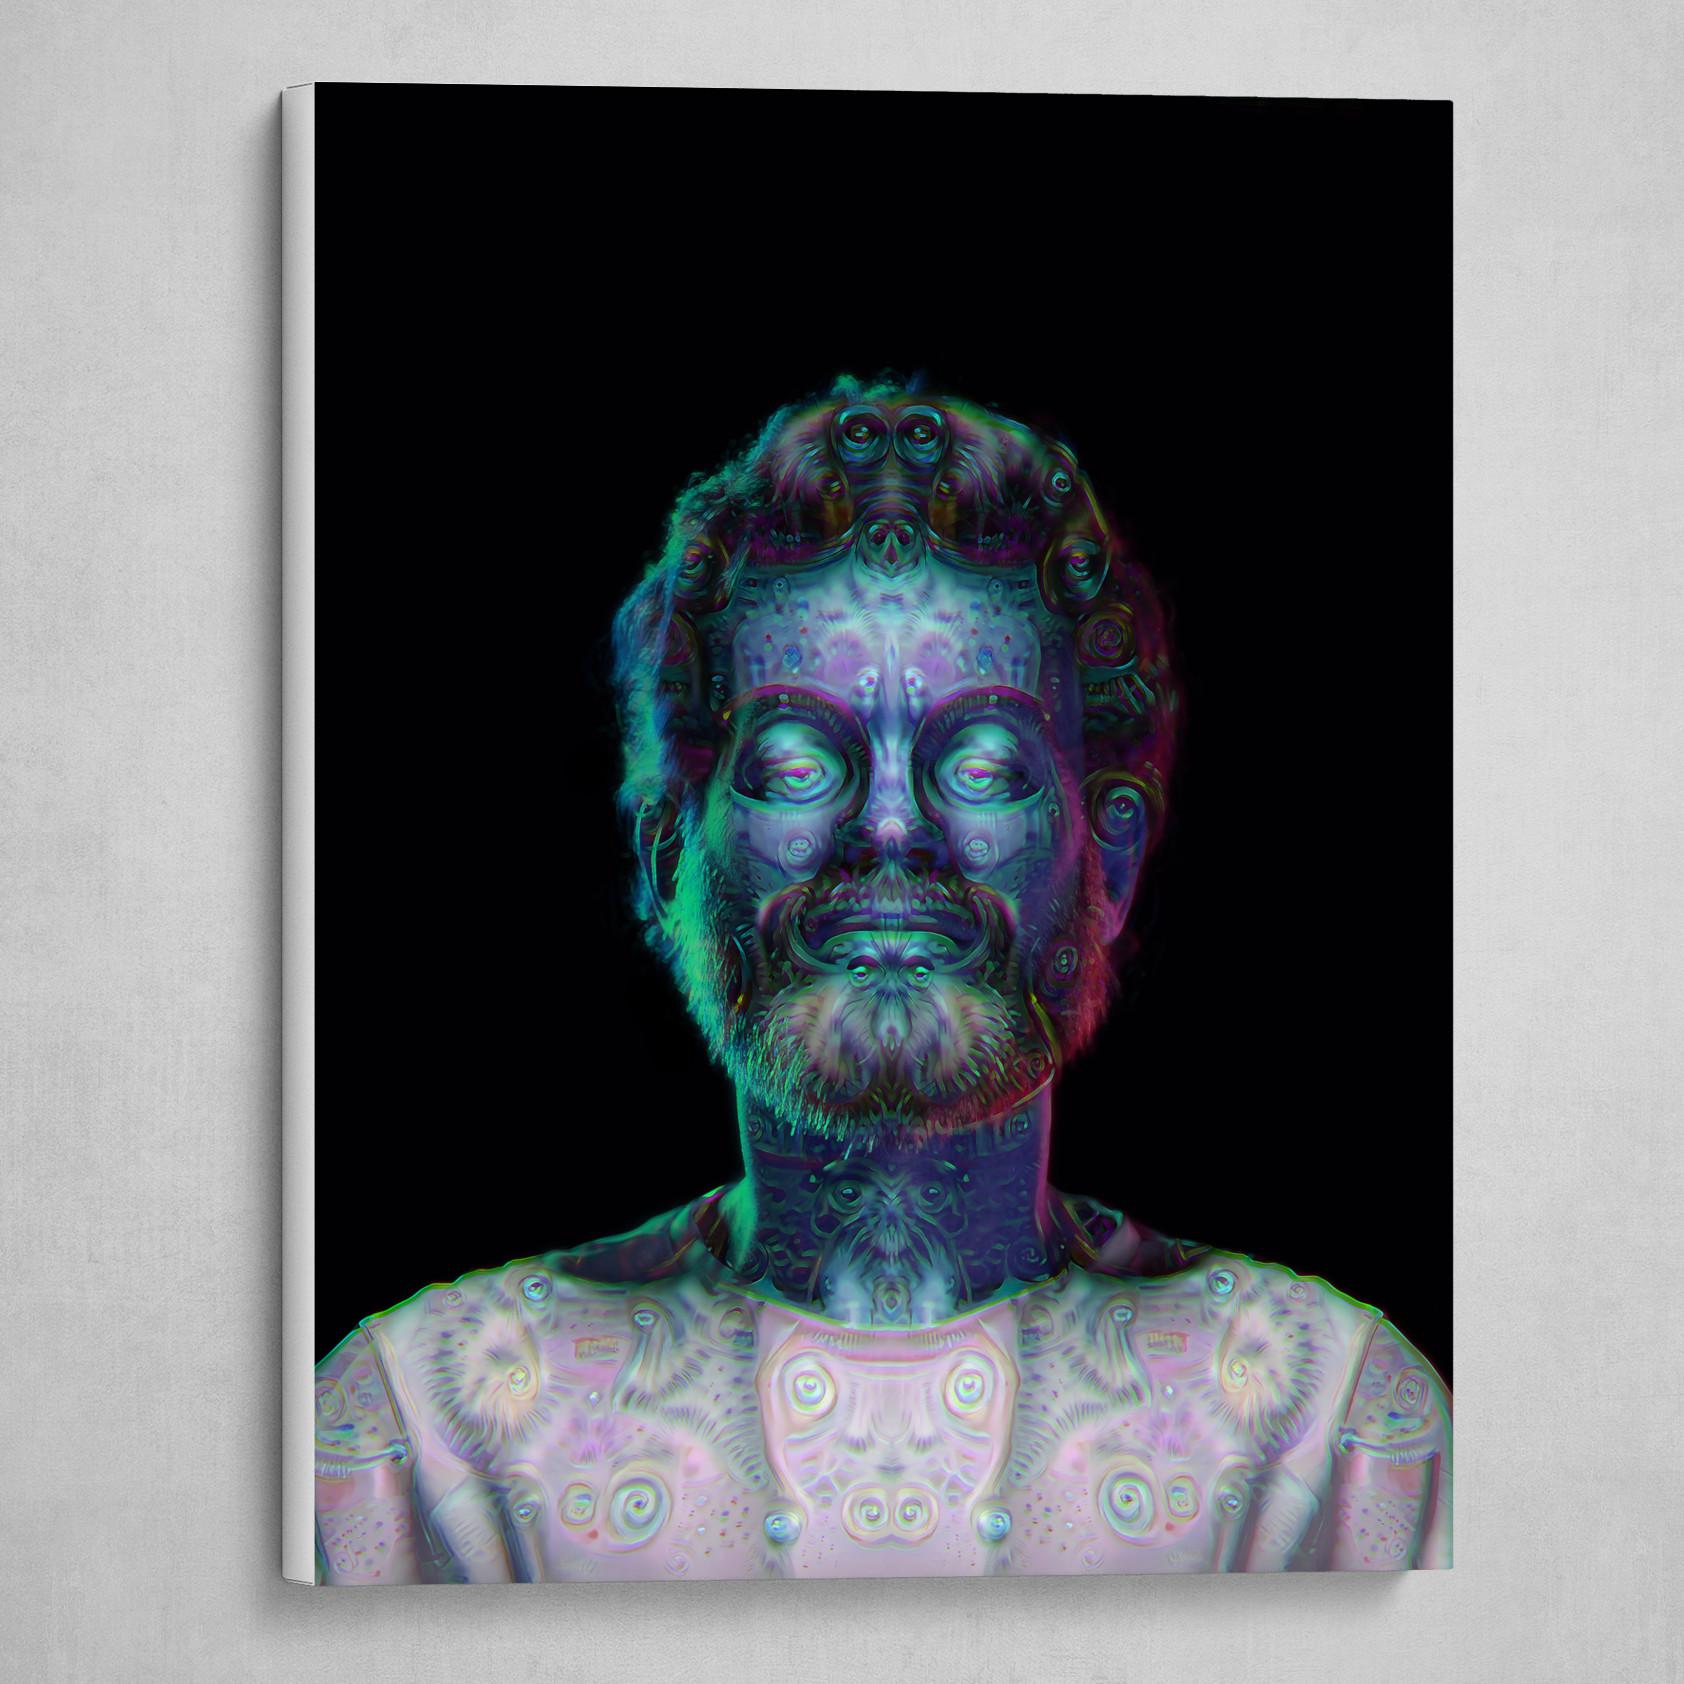 Terence Mckenna Digital Bust #4